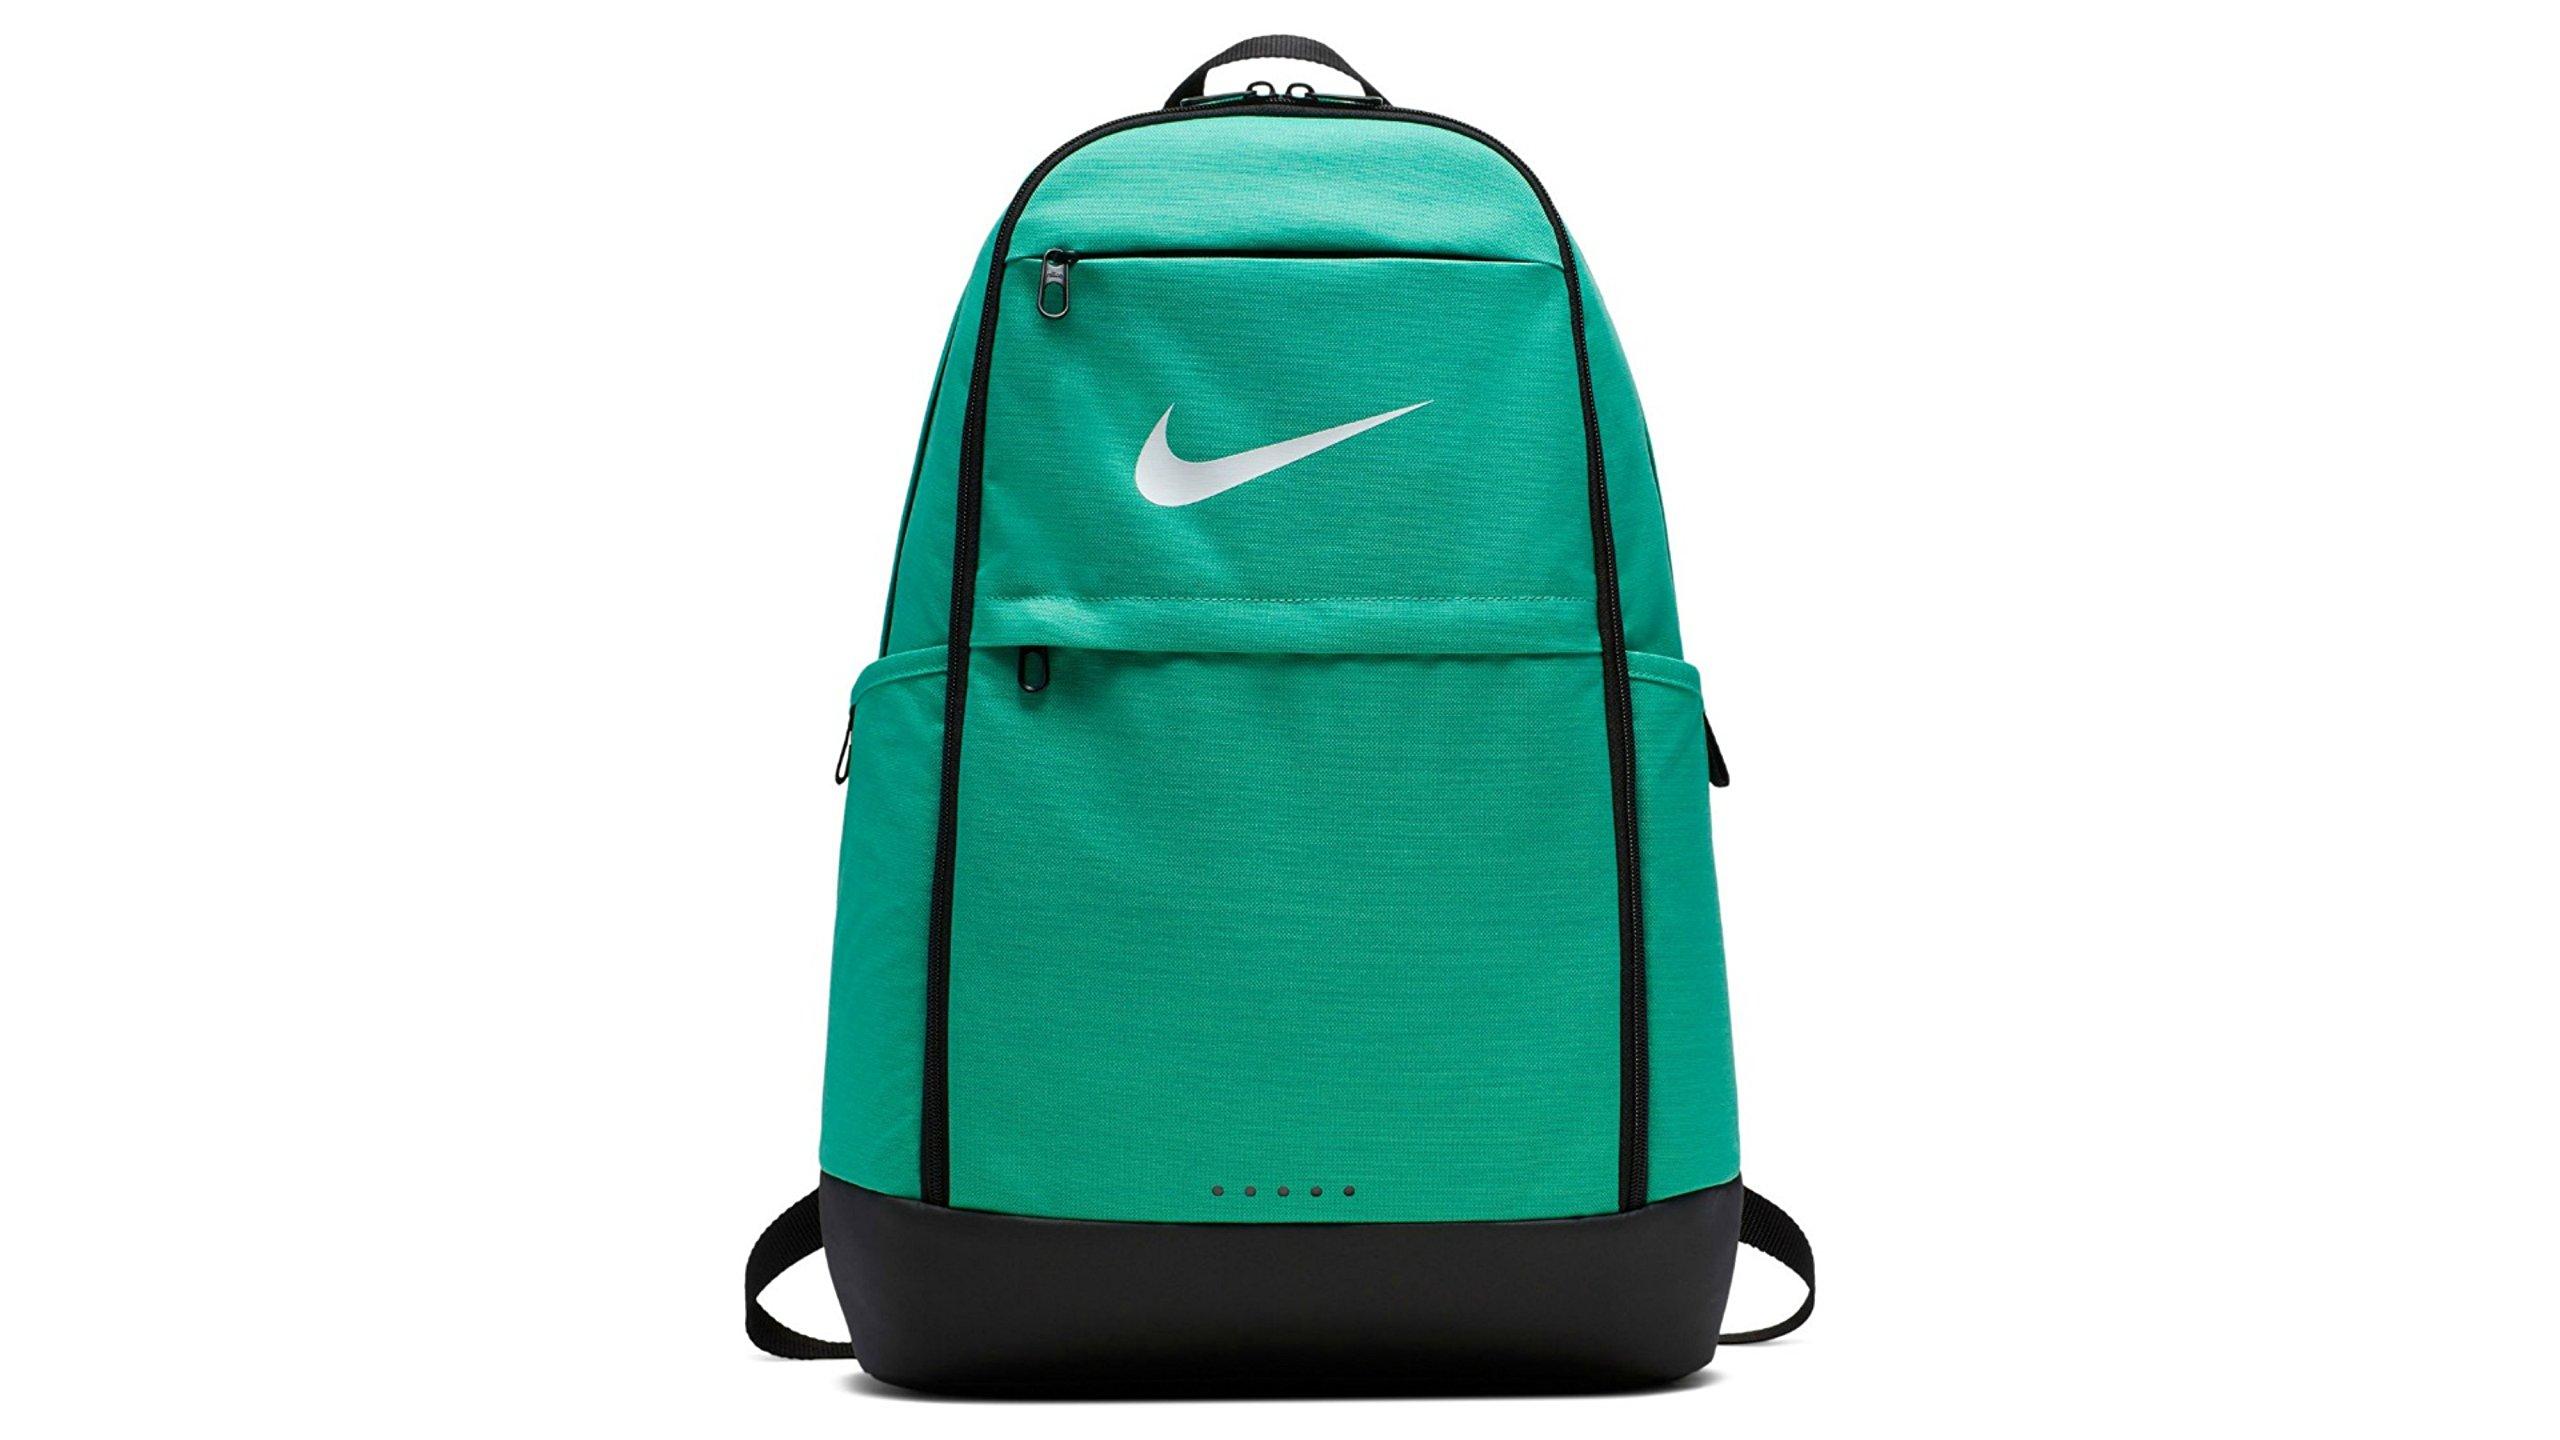 Nike XL Unisex Laptop Backpack School Bag